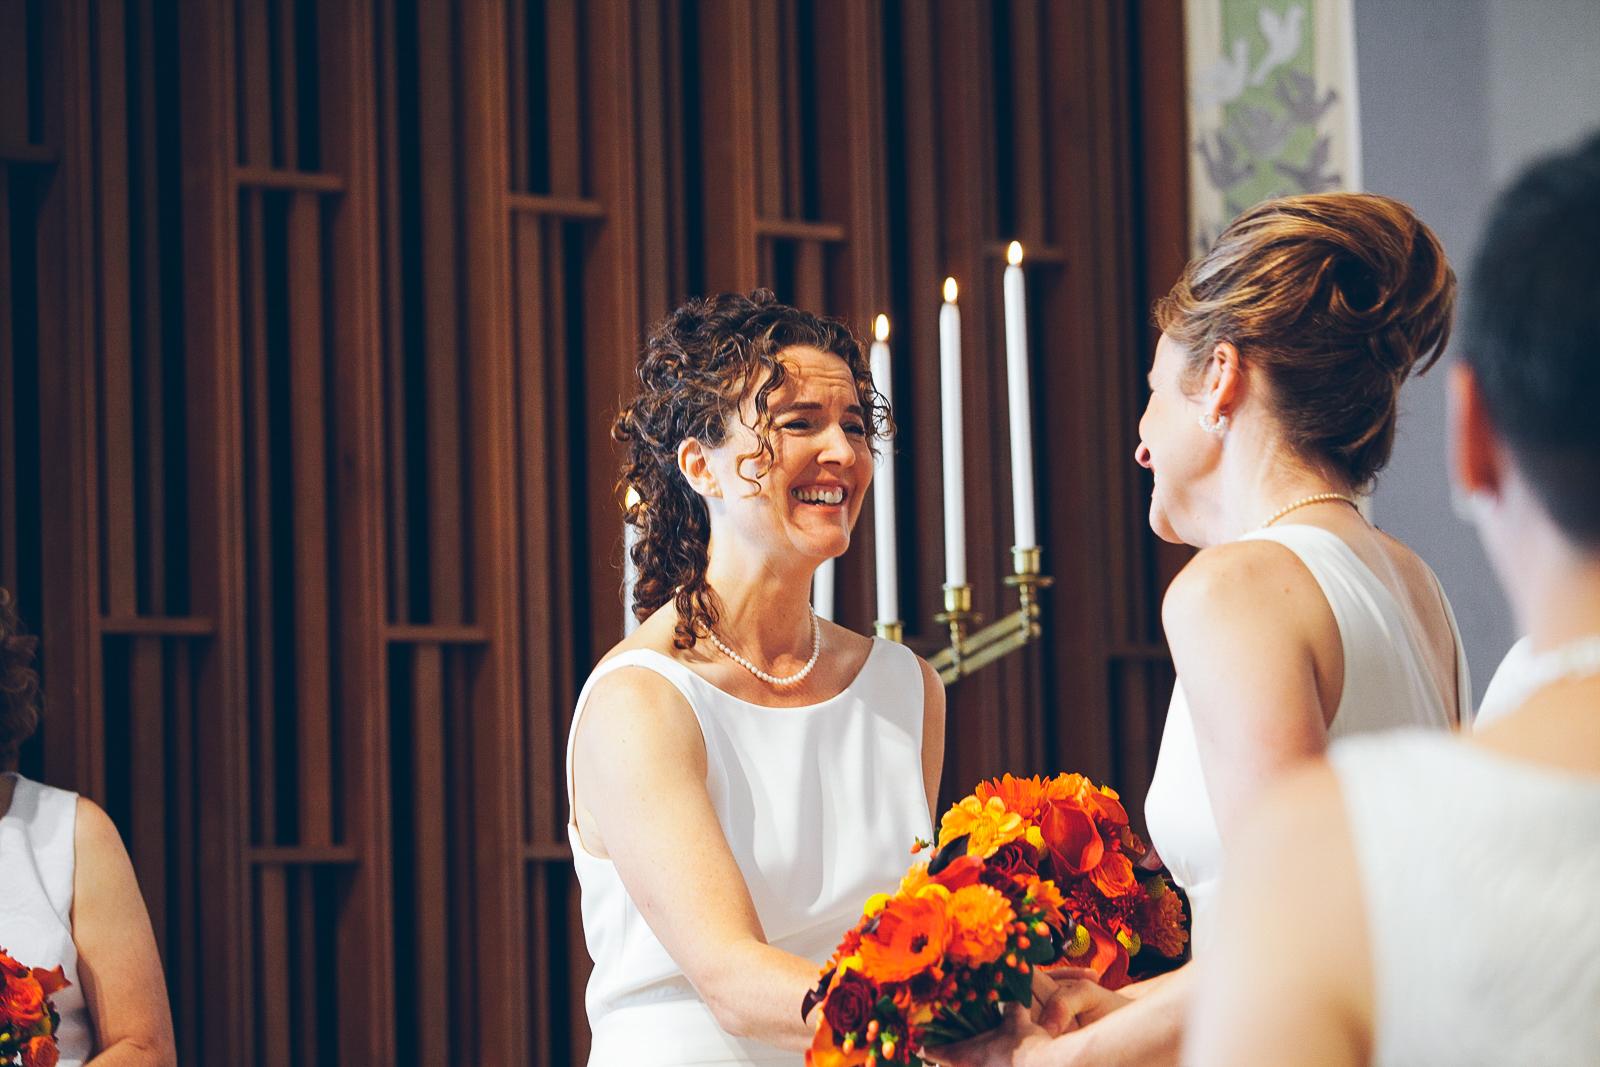 Riverside_ca_wedding_photography_marguerite_carolyn_ebony_siovhan_bokeh_photography_31.jpg